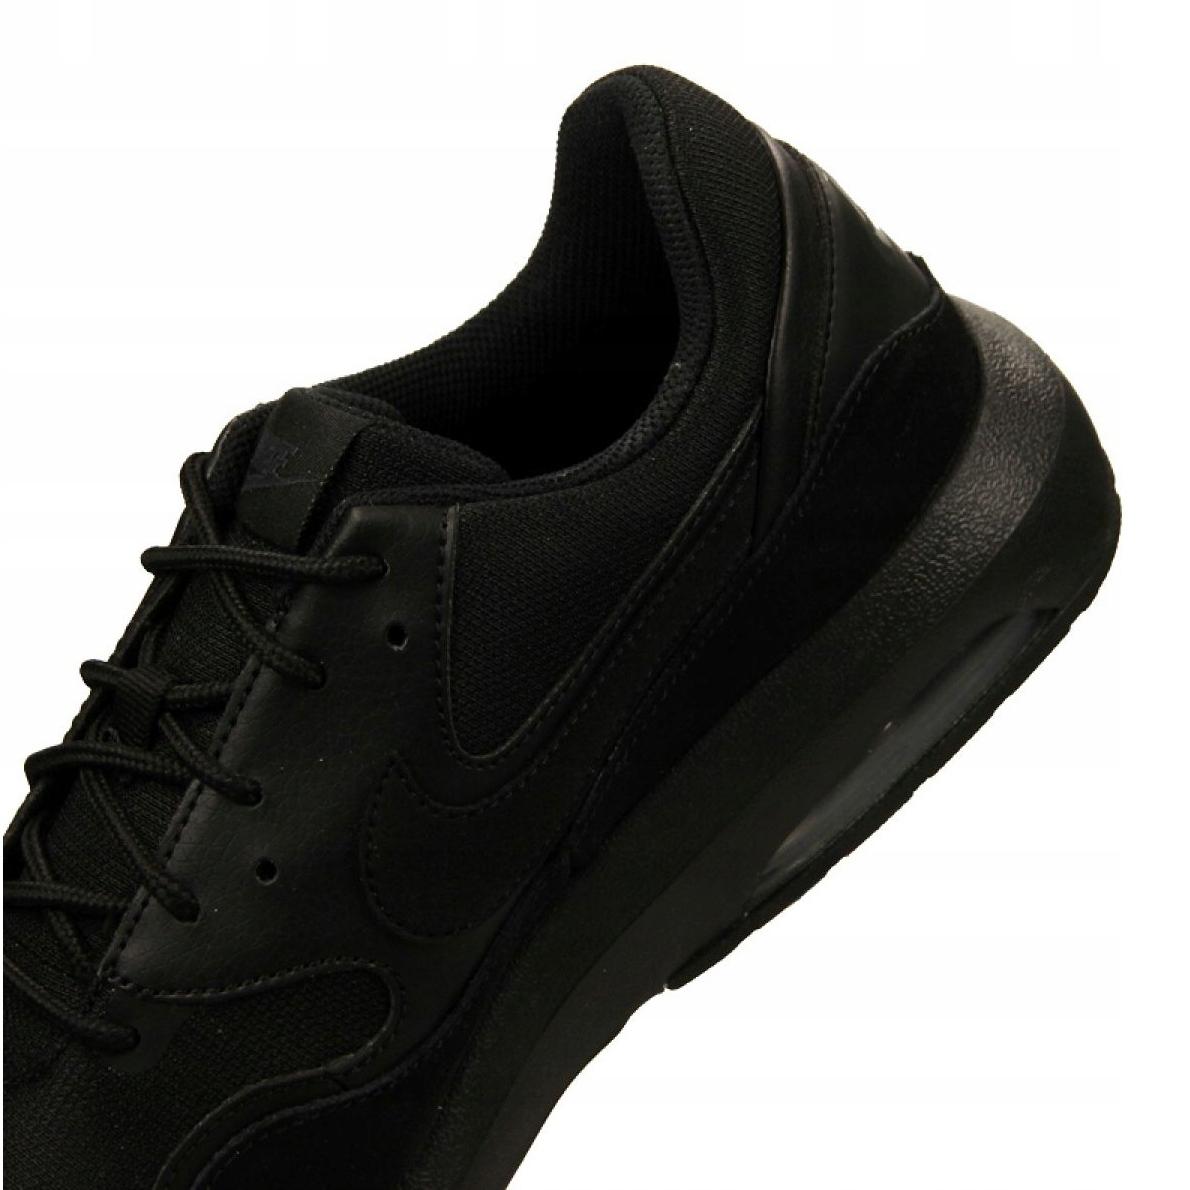 Sapatilhas Nike Air Max Nostalgic M 916781 006 preto